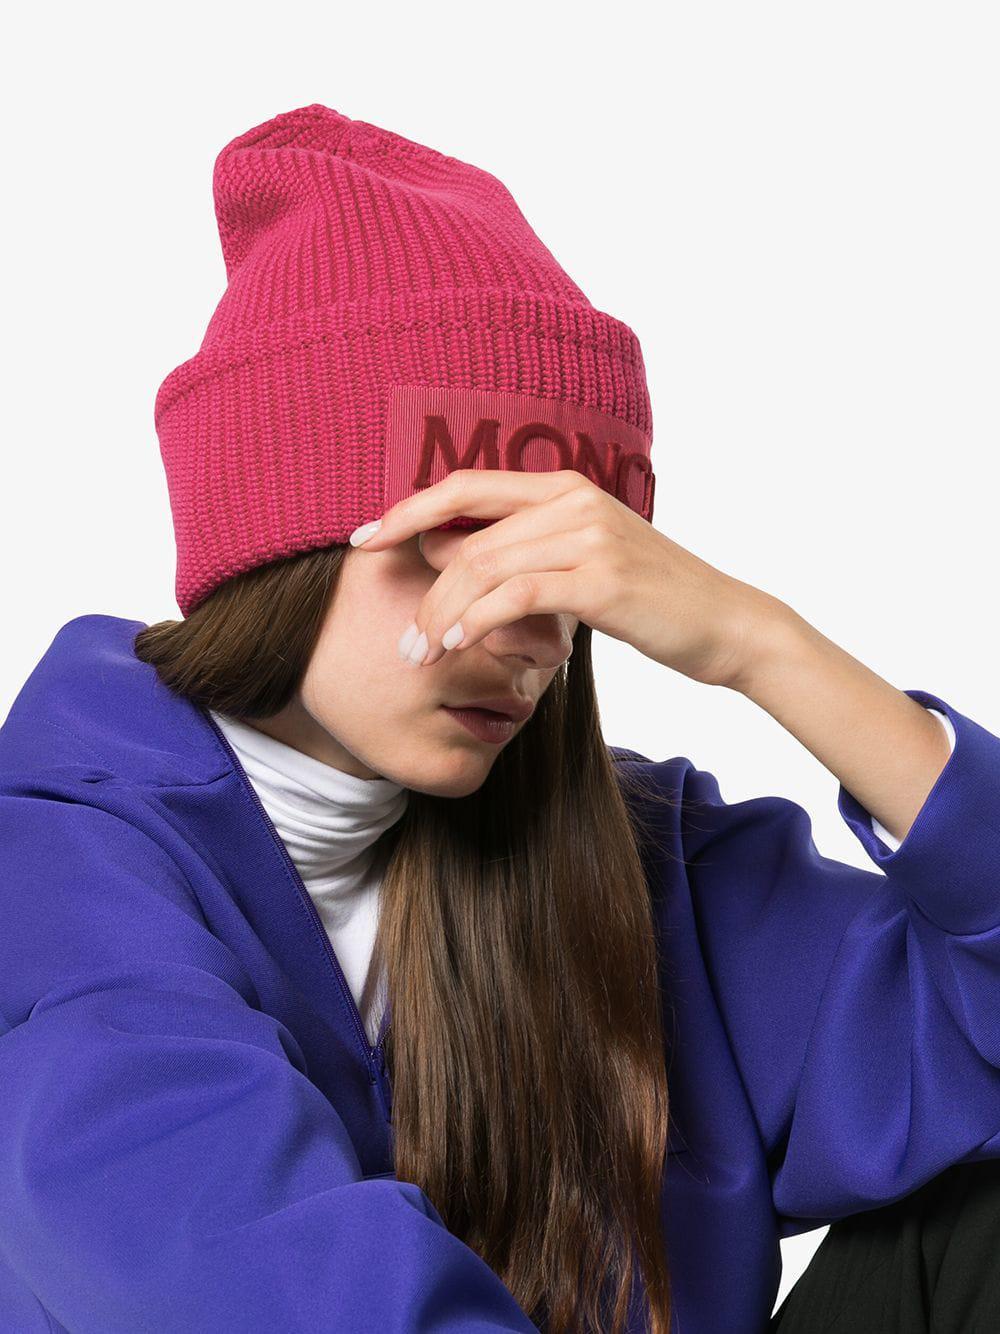 de6cb0a24b5 Lyst - Moncler Pink Logo Beanie in Pink - Save 40%